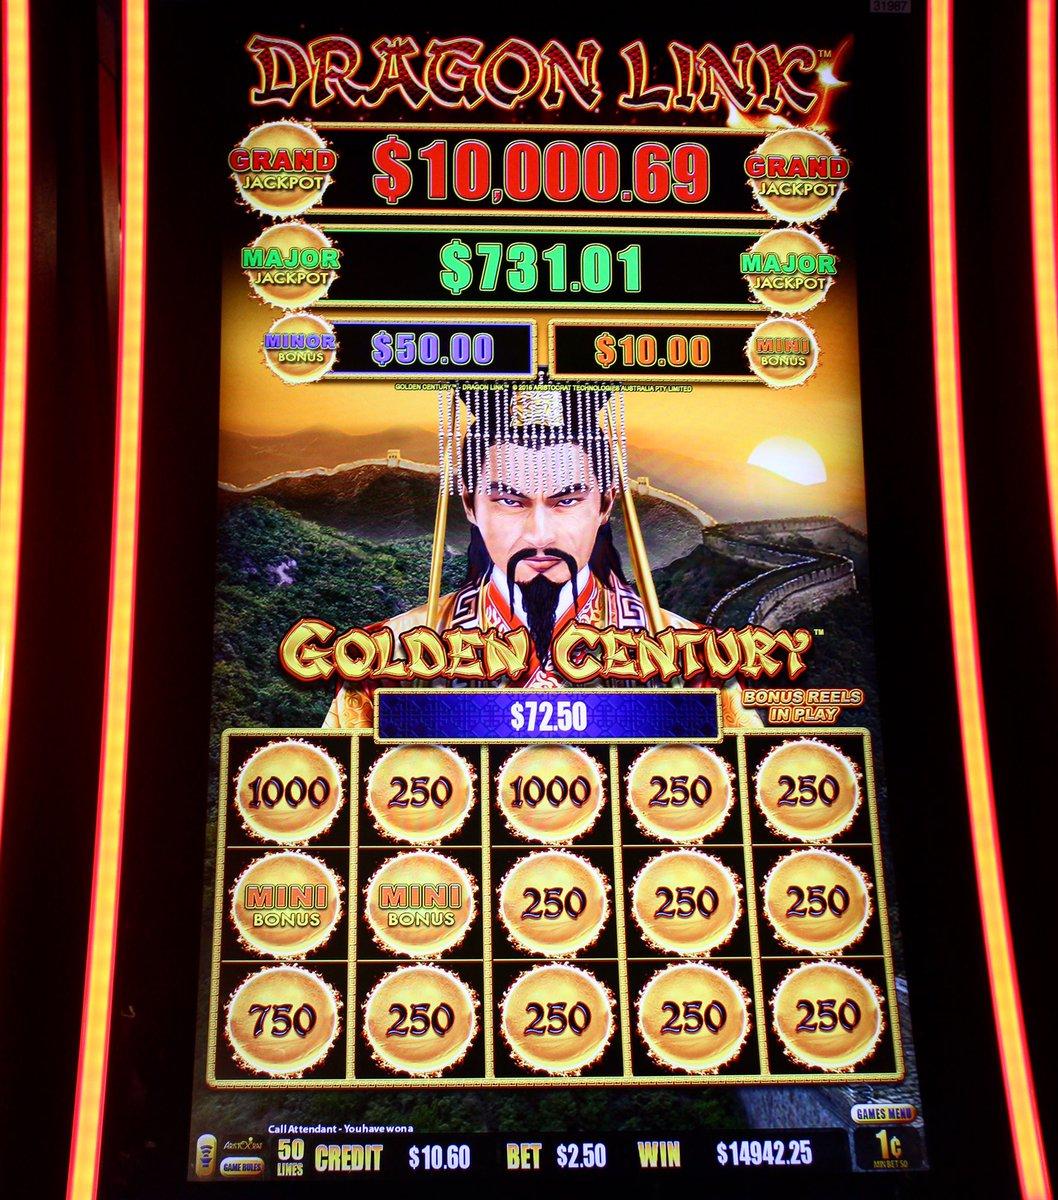 Nice jackpot on Dragon 🐉 Link ! 🎰#Jackpot #Morongo #Monday #Slot #BigWin #SlotPlayer #MorongoCasino #GoodTimes